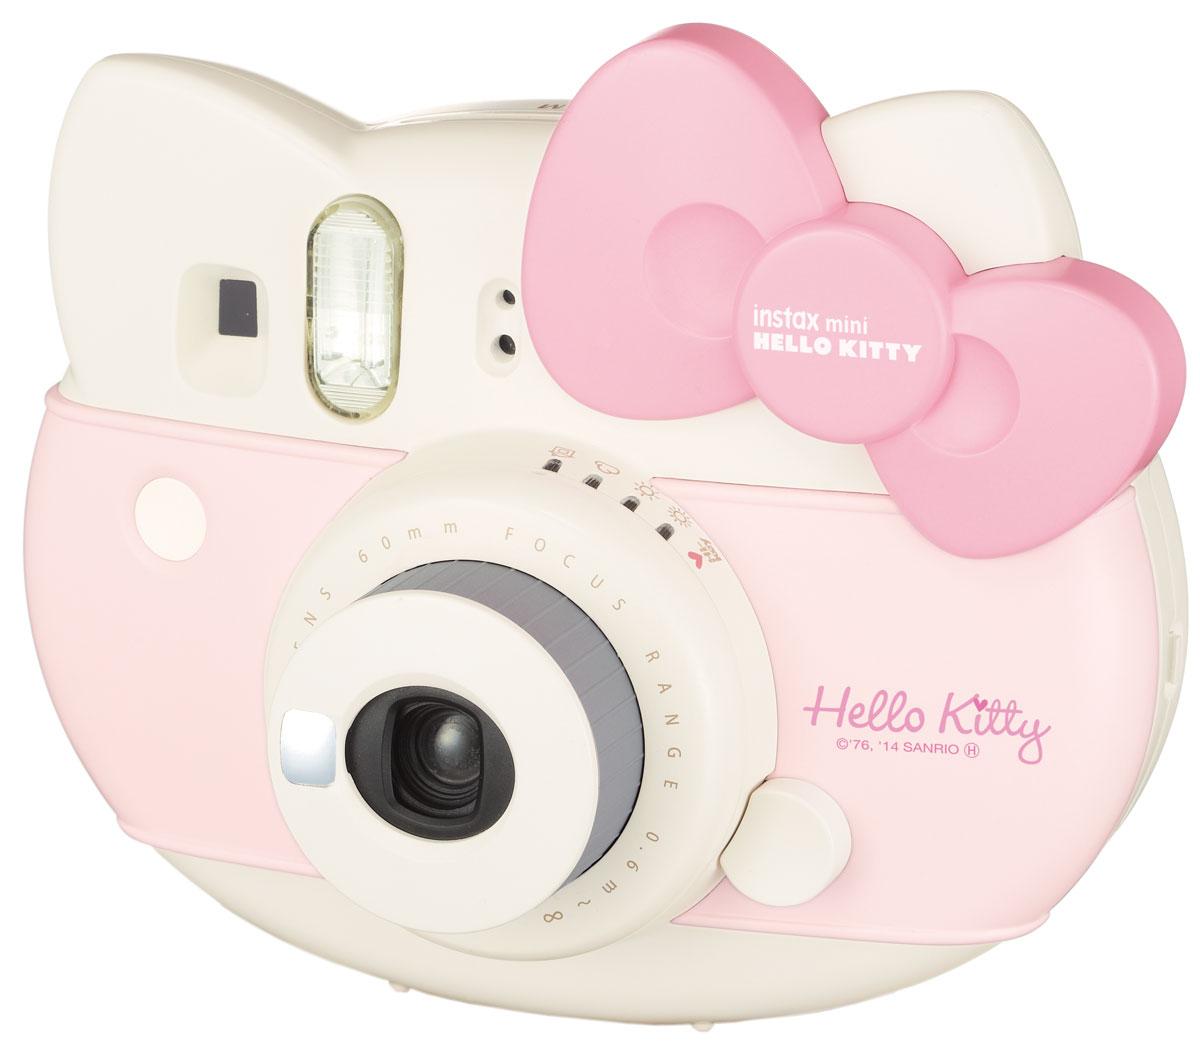 Fujifilm Instax Mini Hello Kitty, Pink фотоаппарат моментальной печати фотоаппарат моментальной печати fujifilm instax mini 8 pink